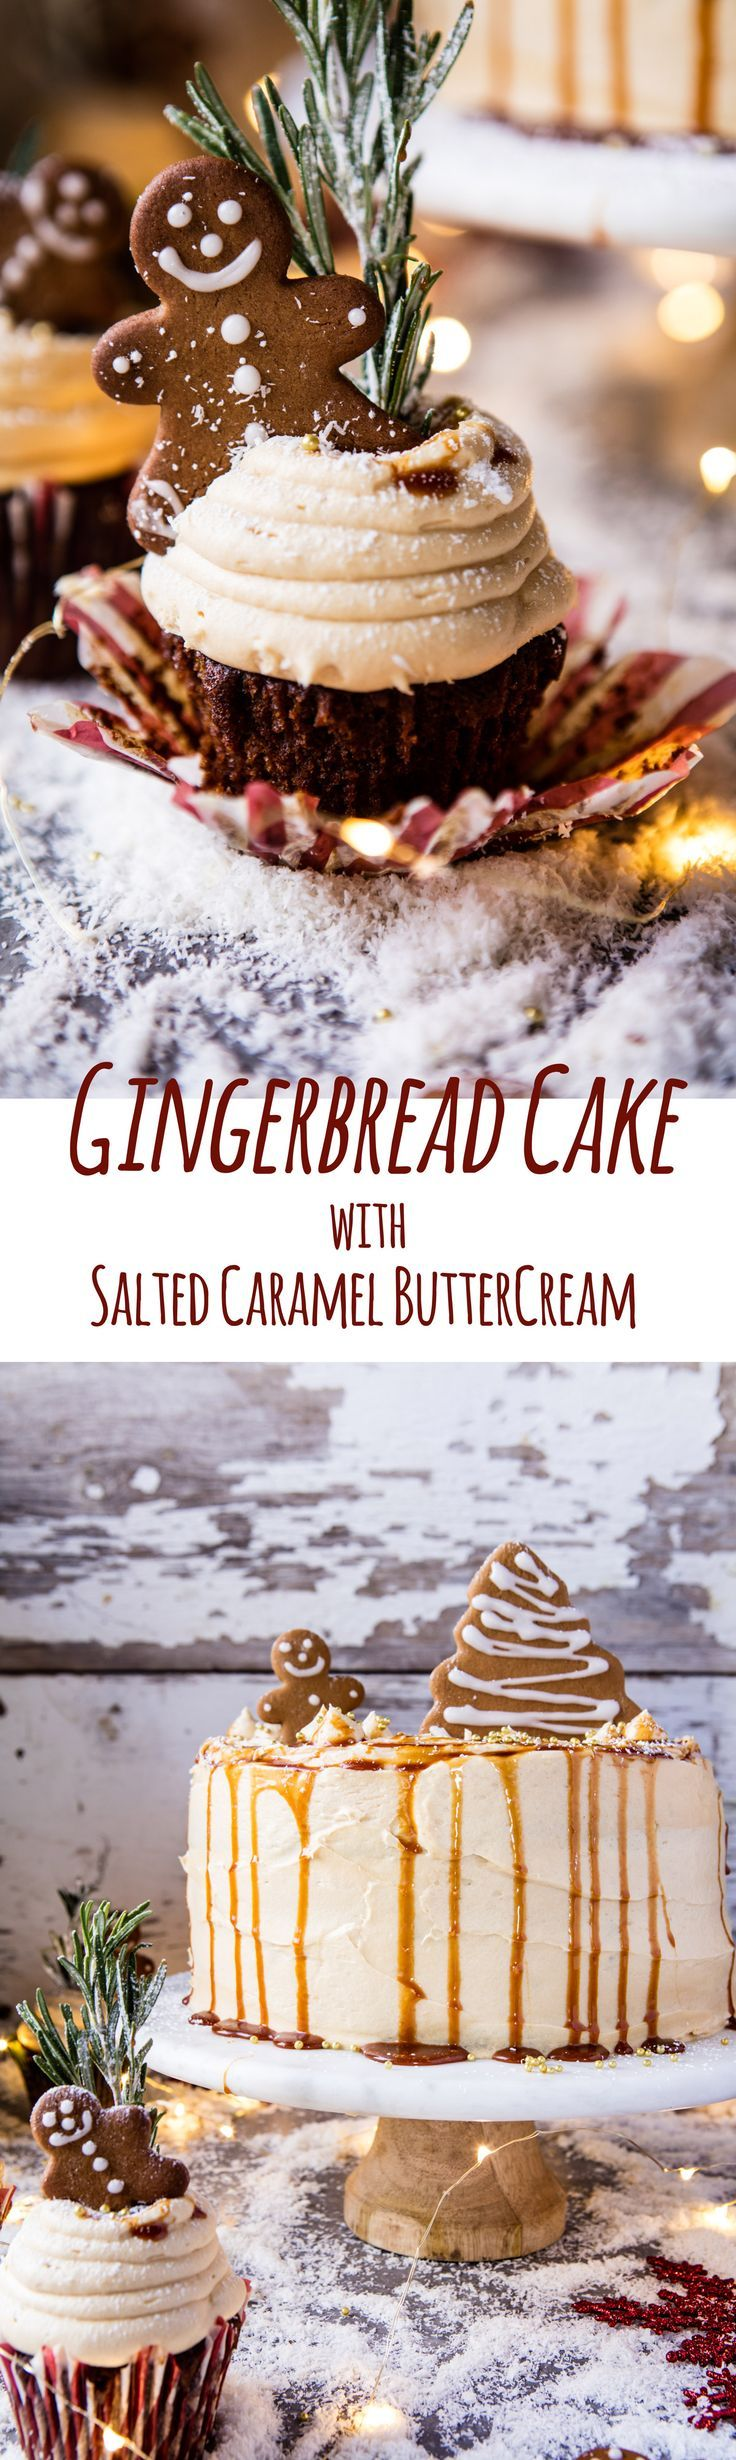 Gingerbread Cake with Caramel Cream Cheese Buttercream   halfbakedharvest.com @Half Baked Harvest